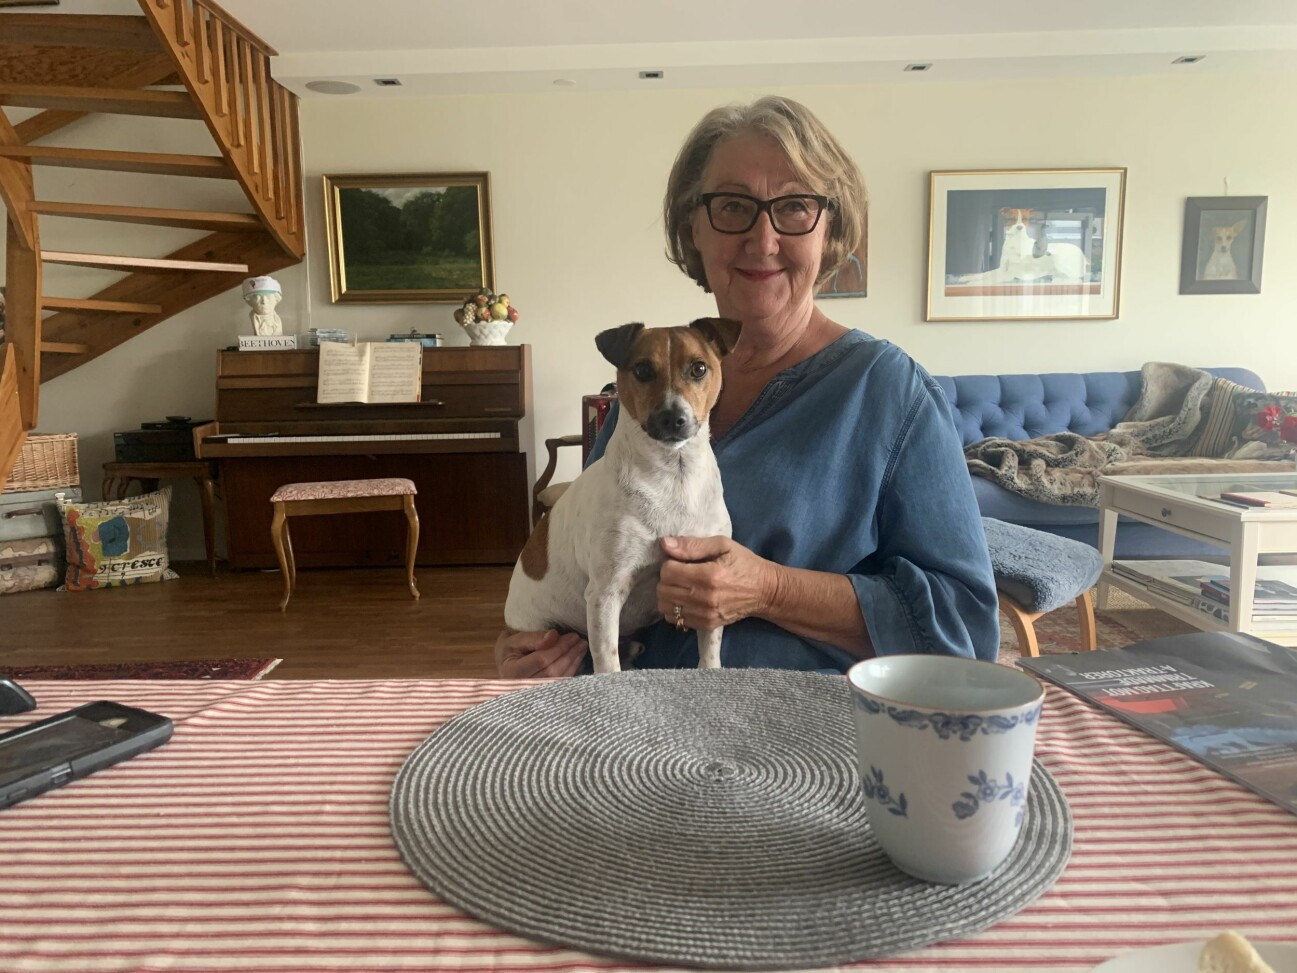 Ewa-Gun Westford och hunden Allan